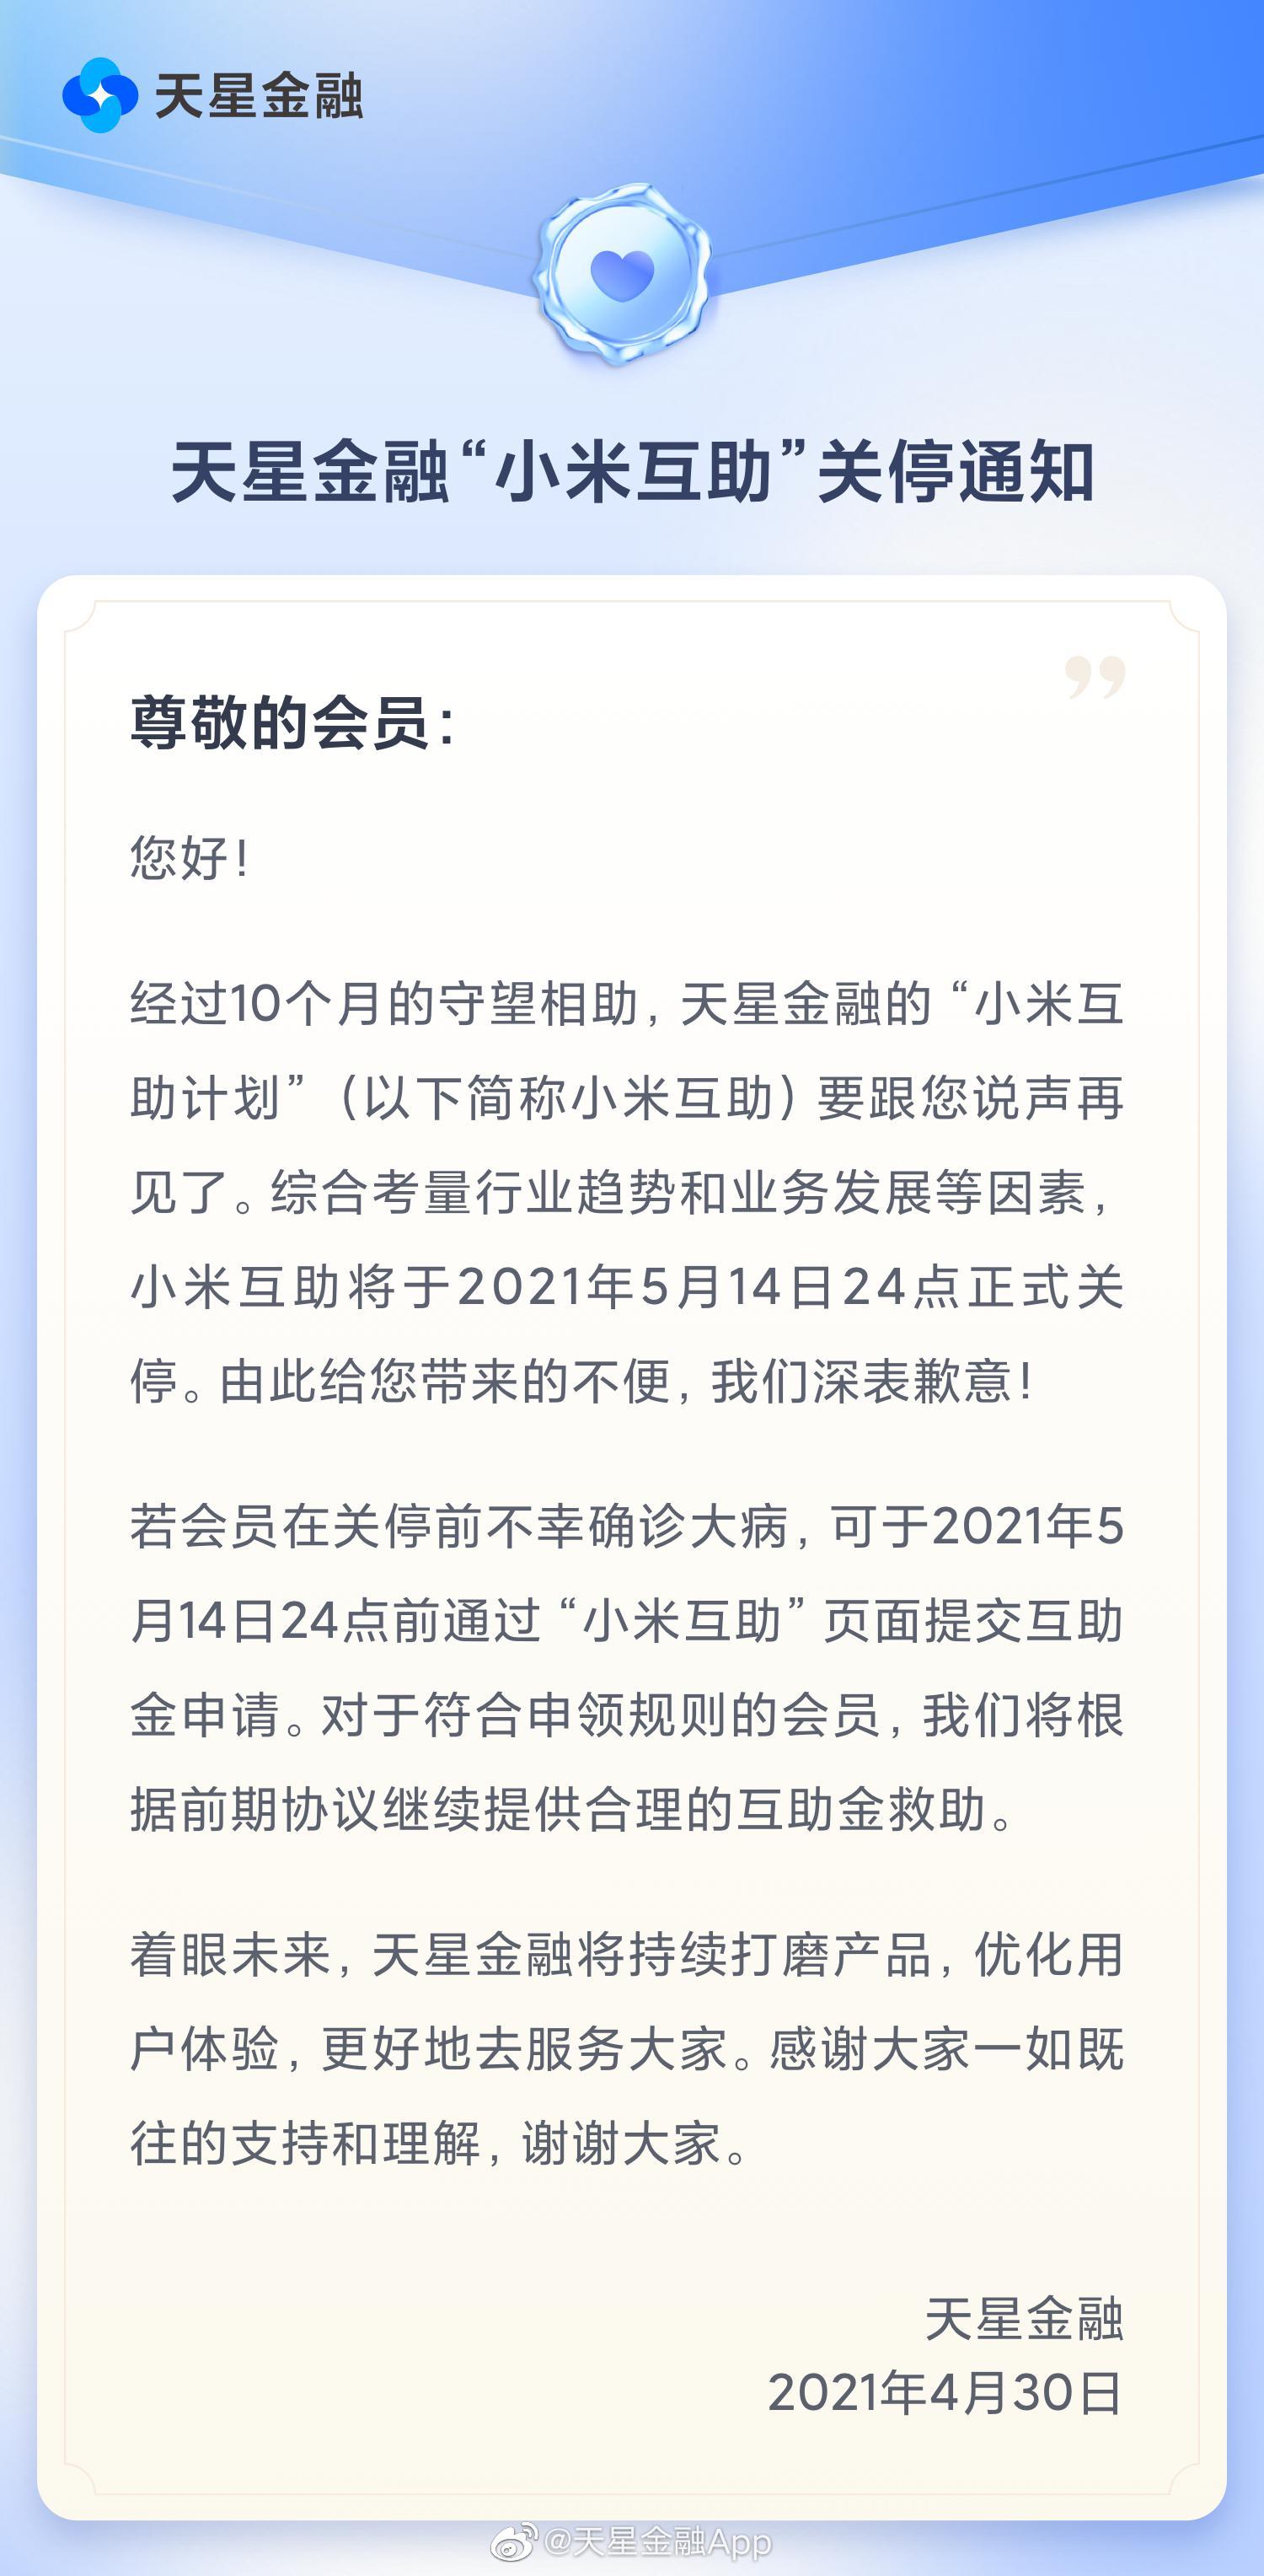 https://n.sinaimg.cn/sinakd2021430s/556/w1500h3056/20210430/3794-kpptear5963183.jpg